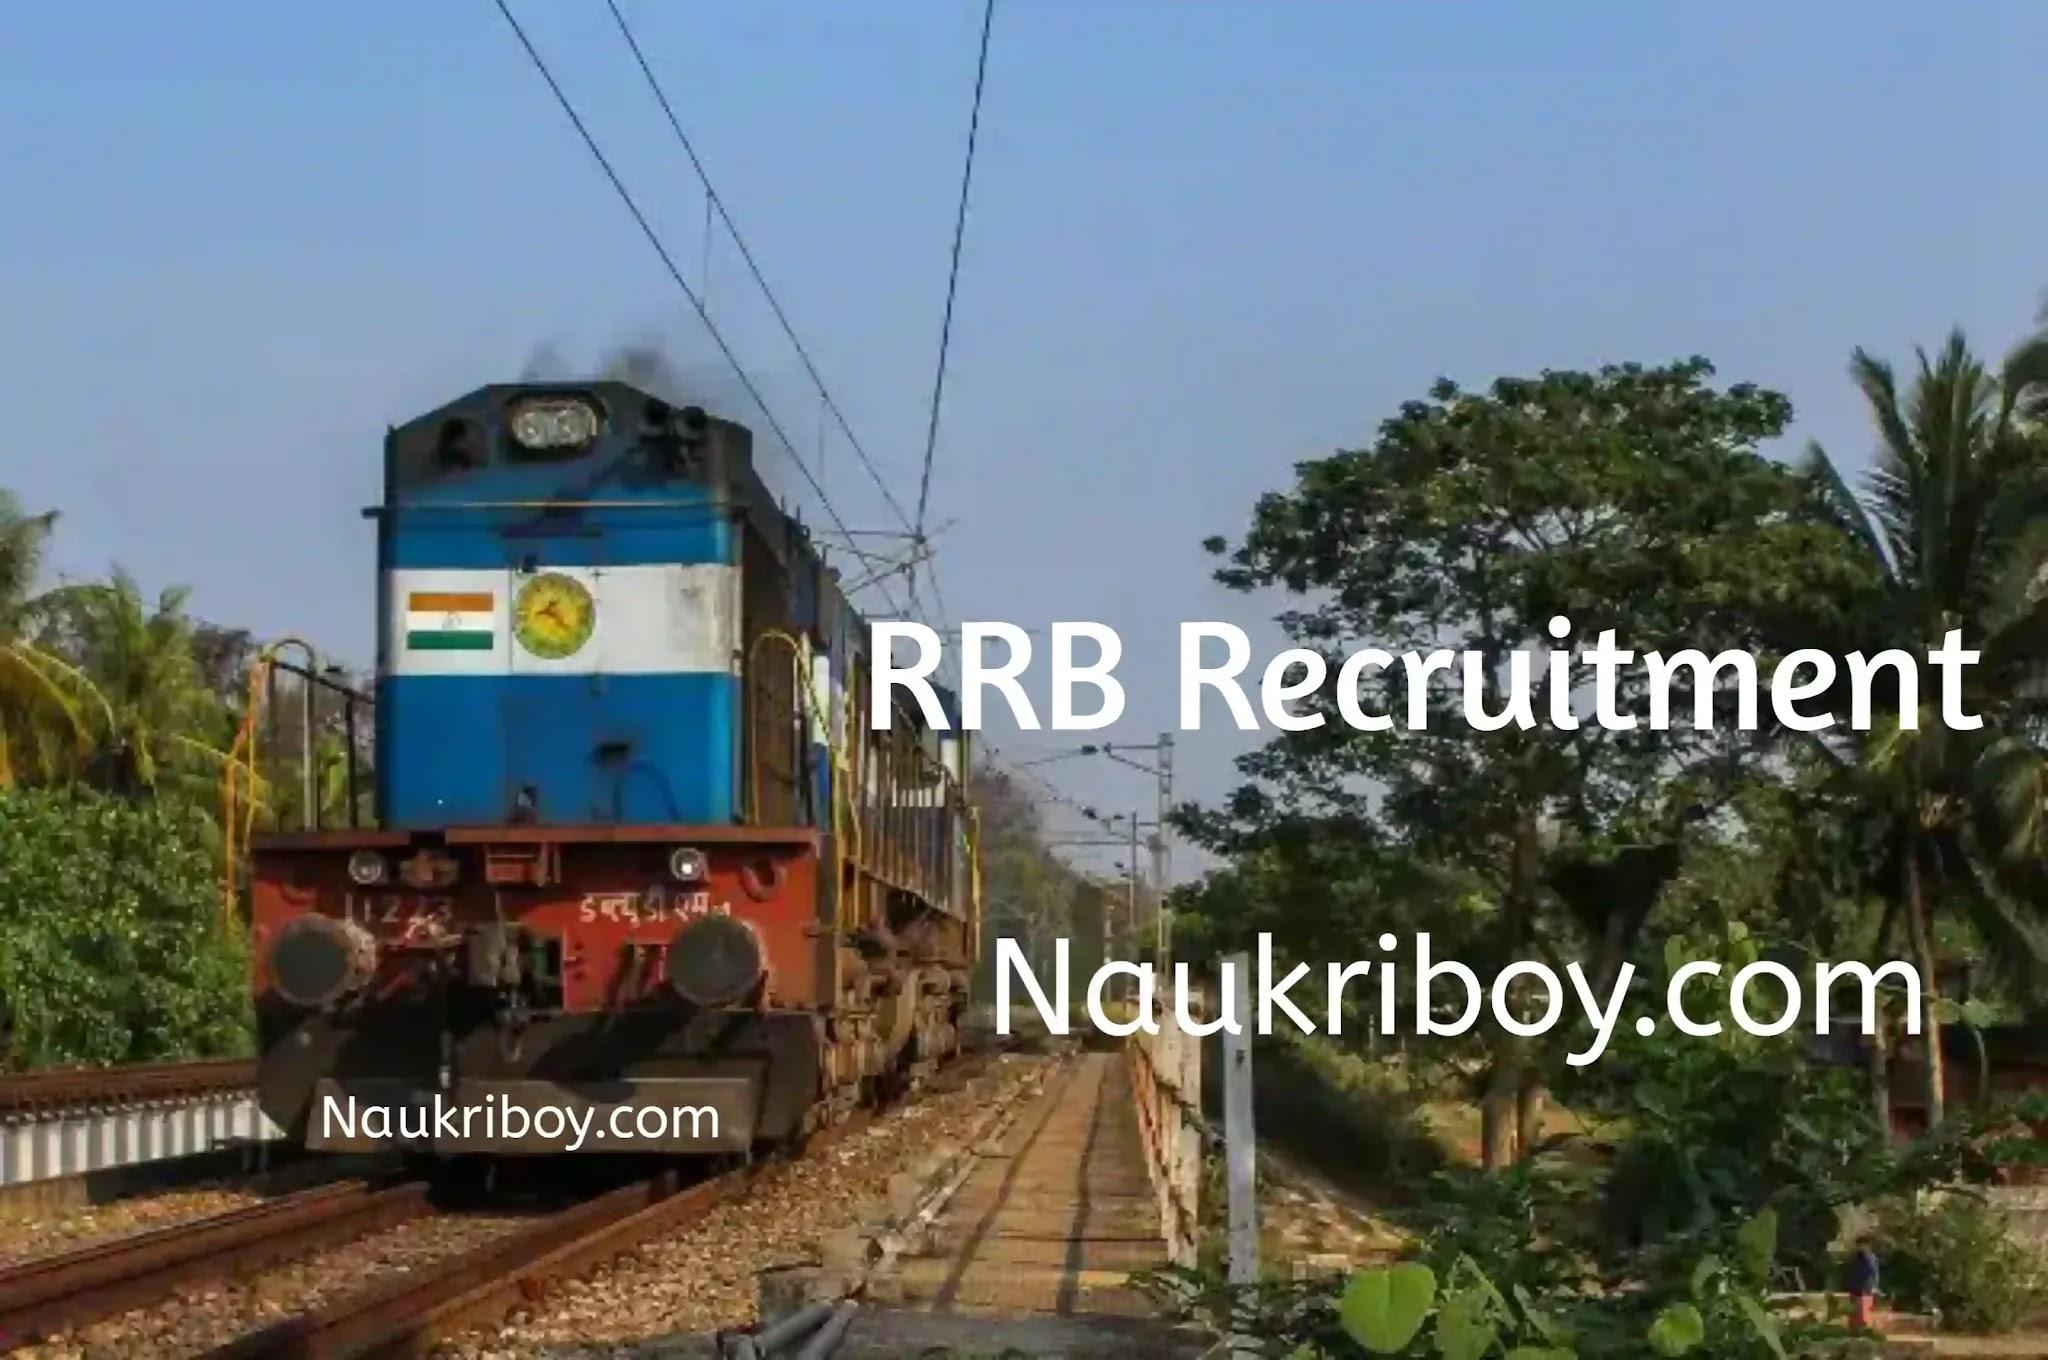 railway jobs 2021, letest indian railway jobs, railway recruitment 2021, rrb, naukriboy.com